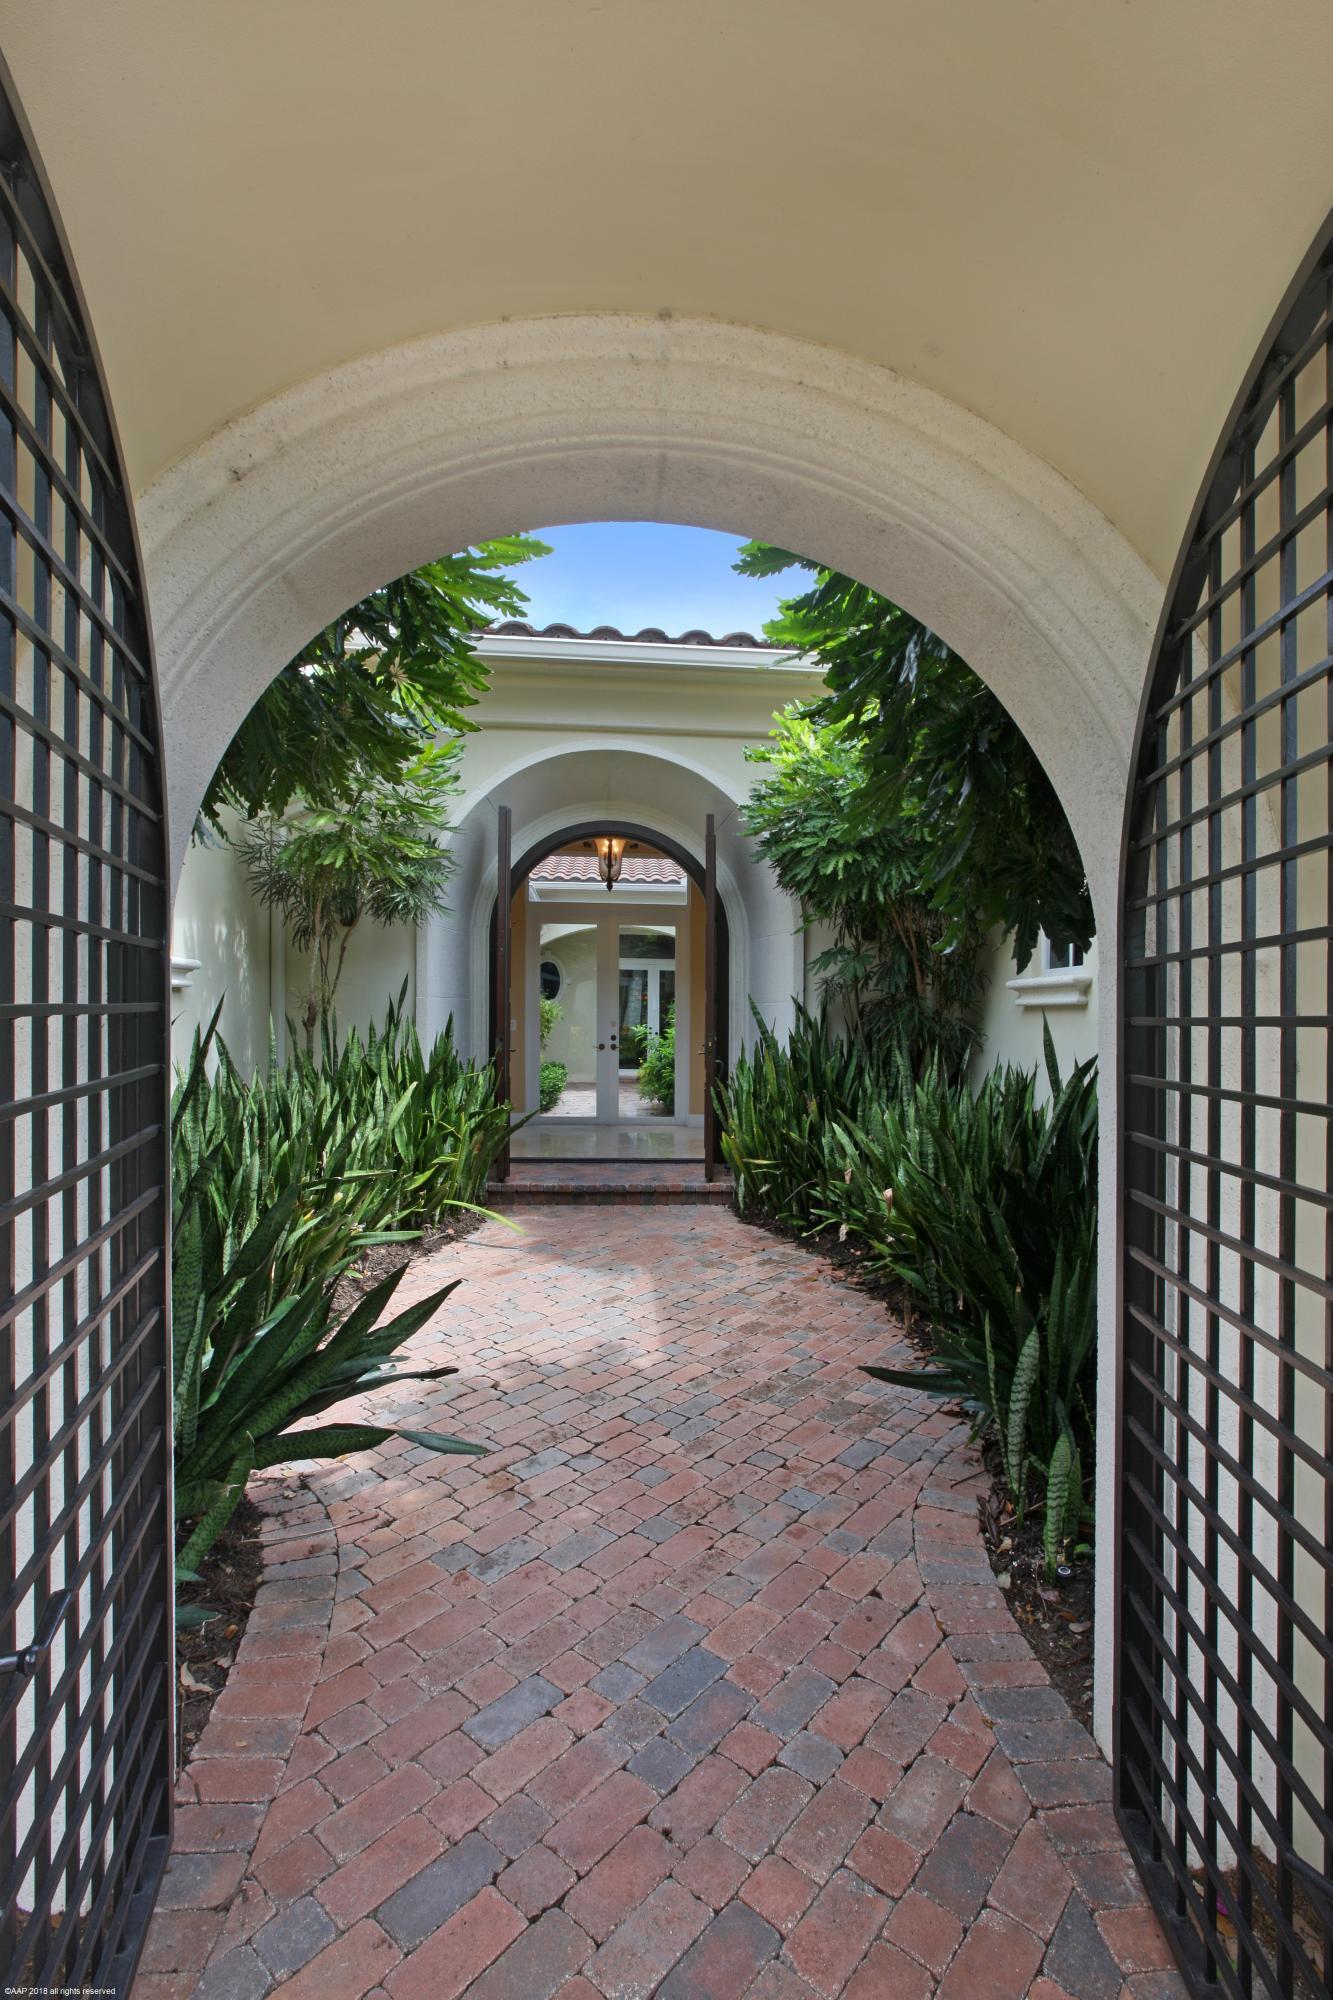 11215 Orange Hibiscus Lane, Palm Beach Gardens, Florida 33418, 3 Bedrooms Bedrooms, ,3.2 BathroomsBathrooms,A,Single family,Orange Hibiscus,RX-10400199